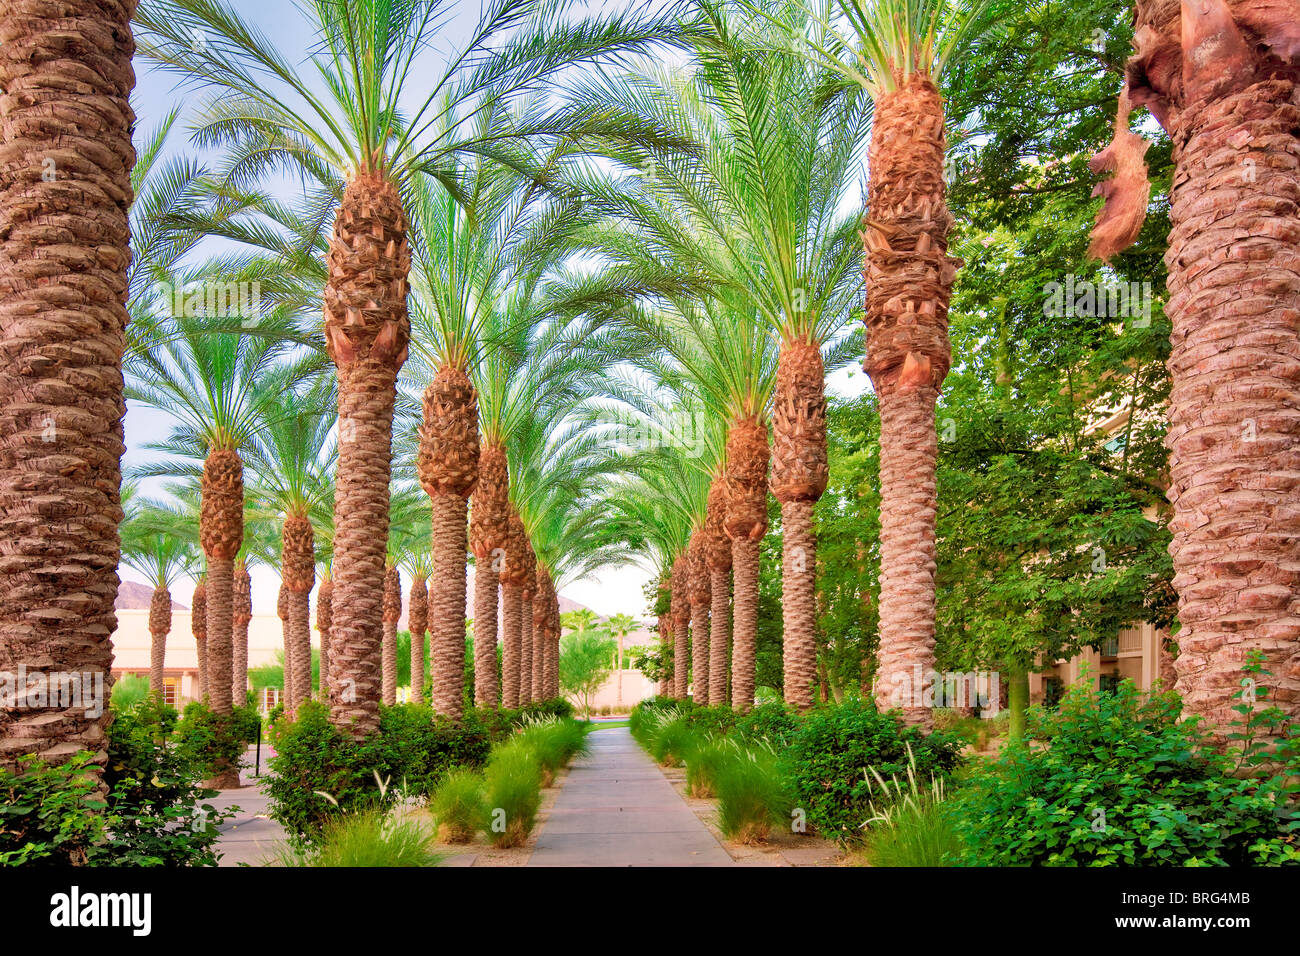 Palm tree lined path. Hyatt. Indian Wells, California - Stock Image